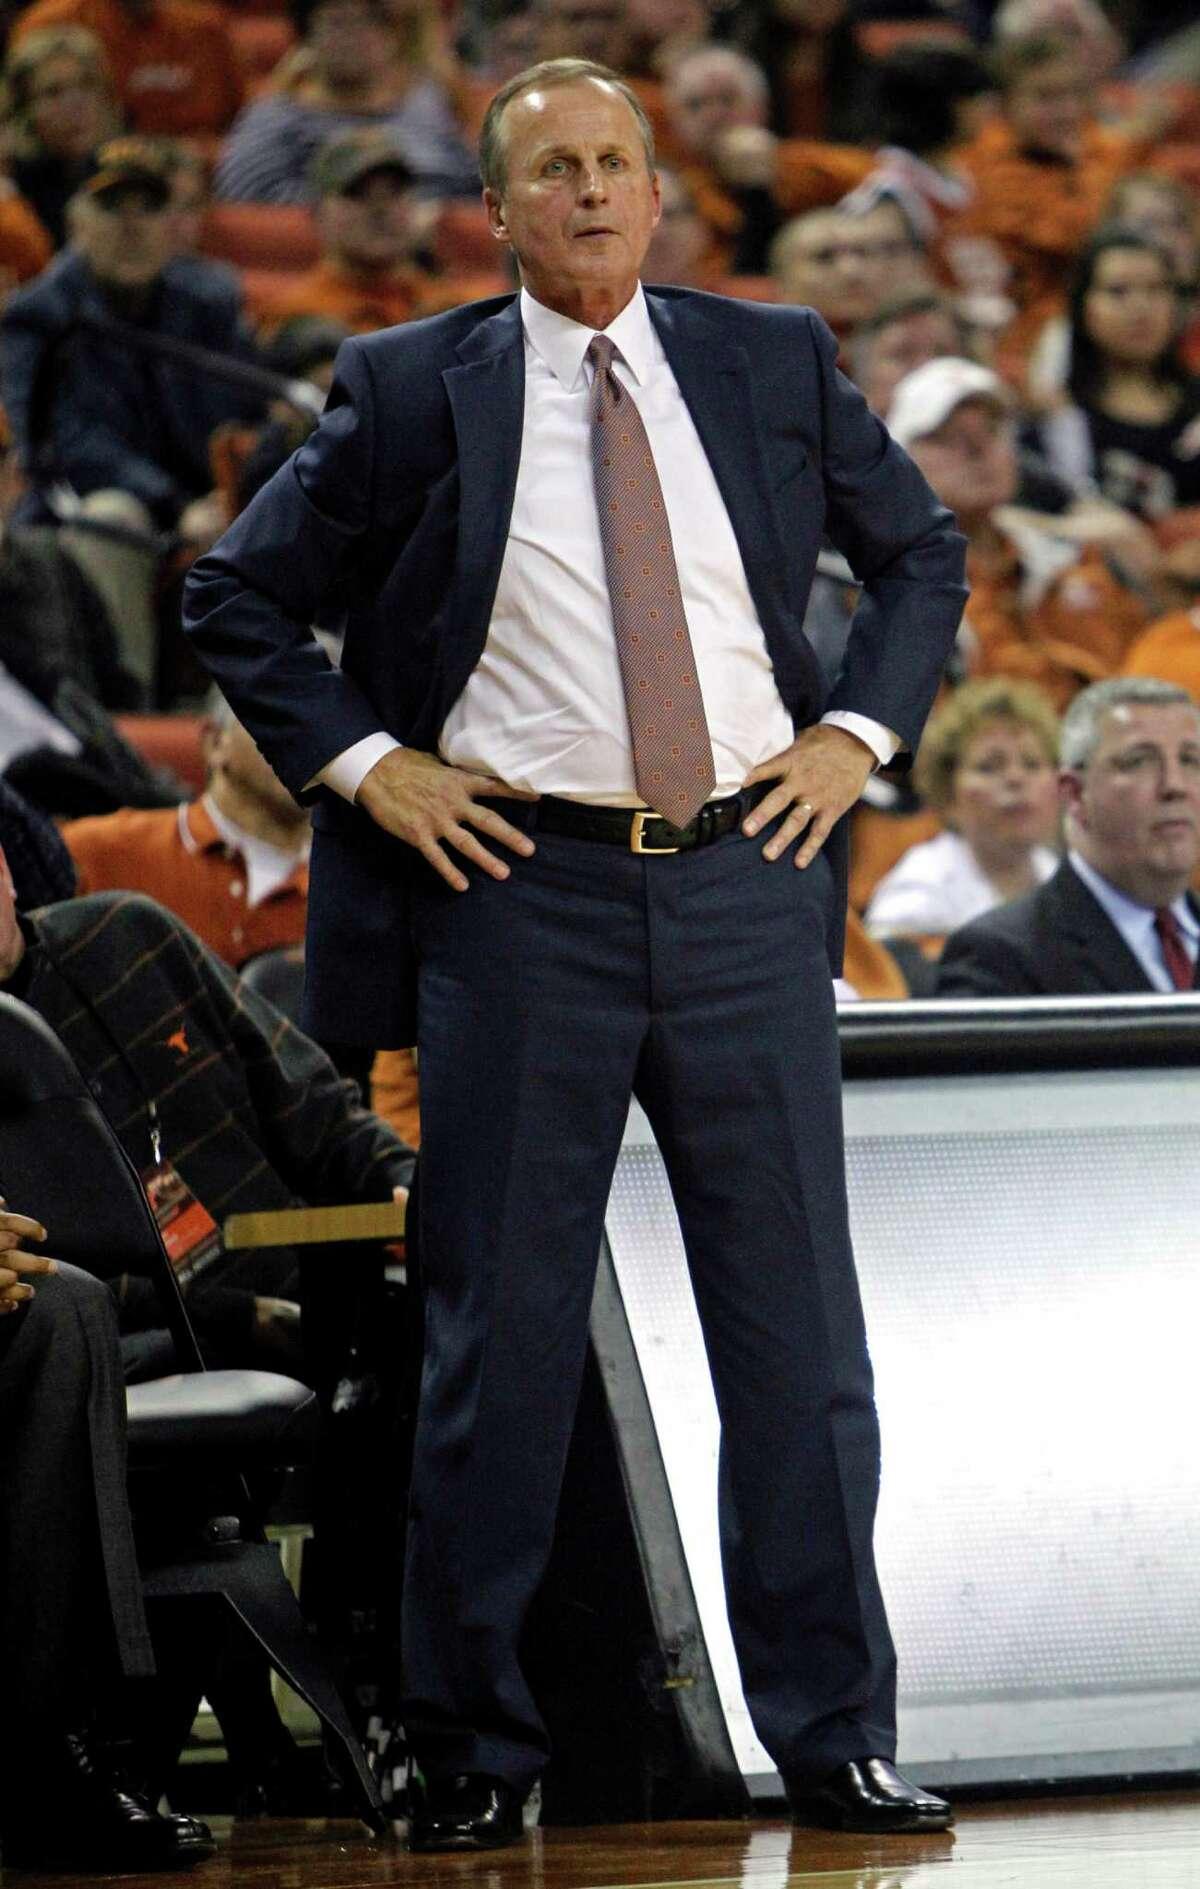 Texas head coach Rick Barnes watches his team during the second half of an NCAA college basketball game against Long Beach State, Saturday, Dec. 20, 2014, in Austin, Texas. (AP Photo/Michael Thomas)